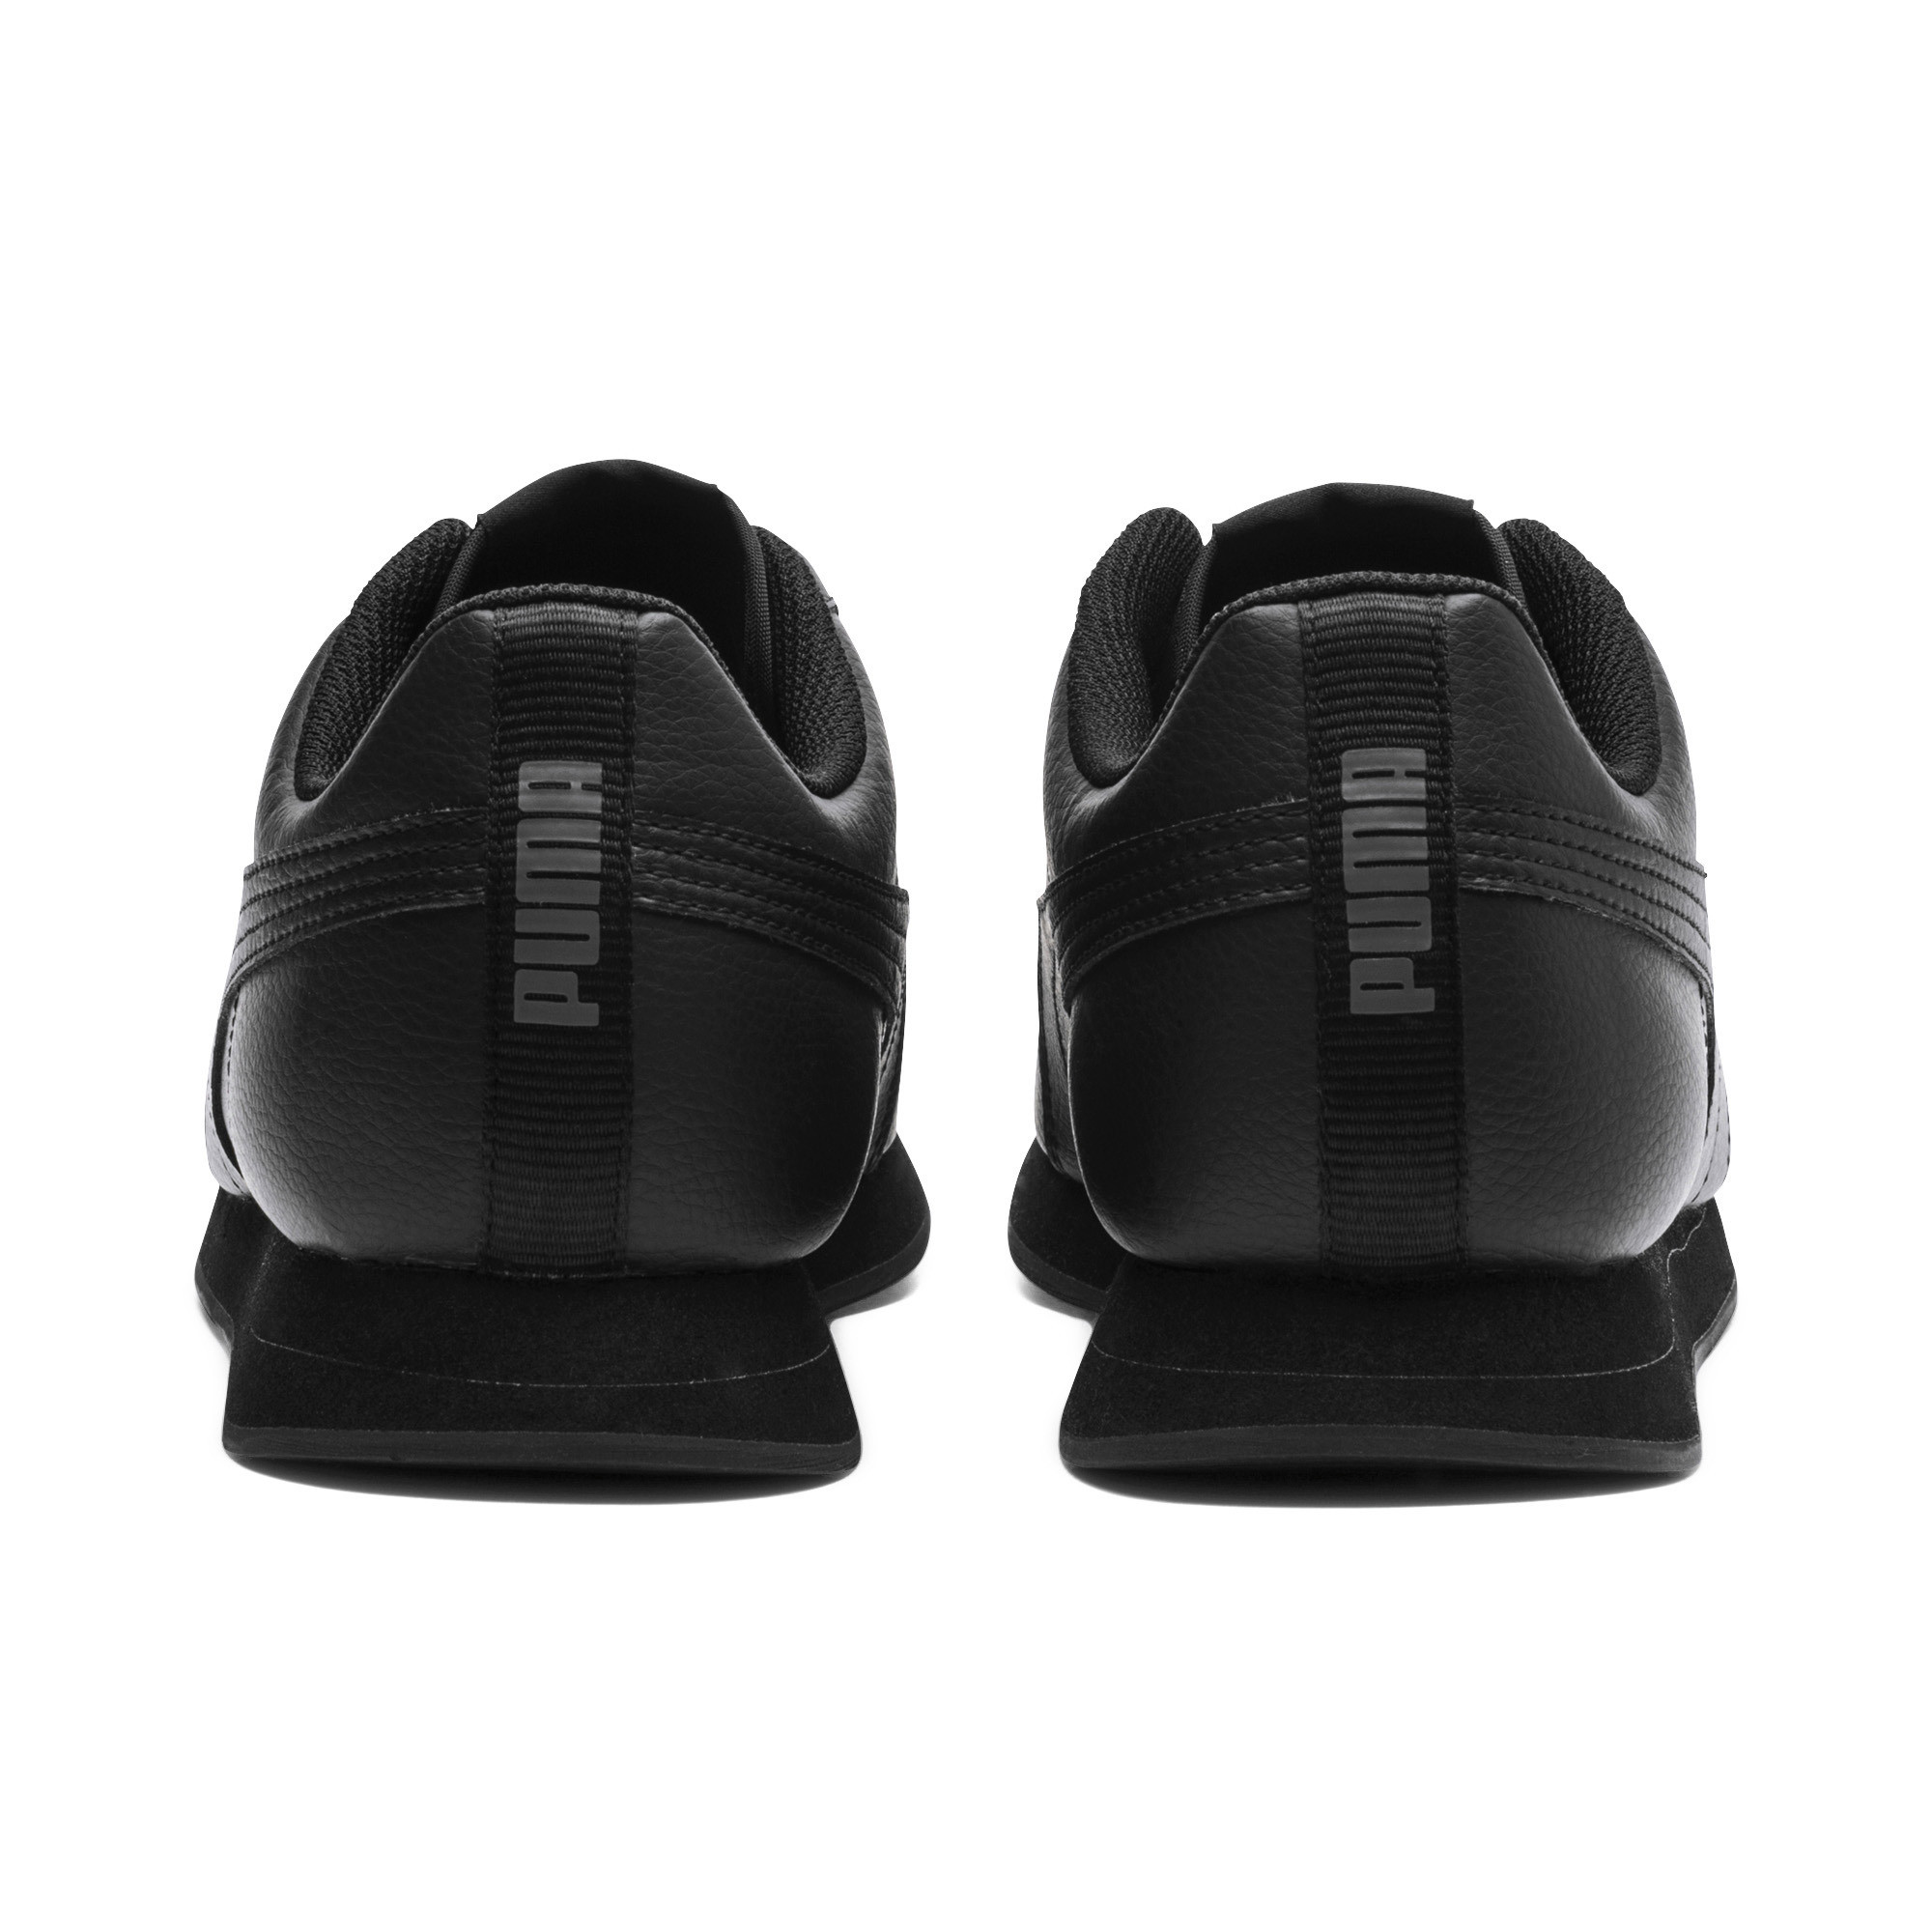 thumbnail 3 - PUMA Men's Turin II Sneakers